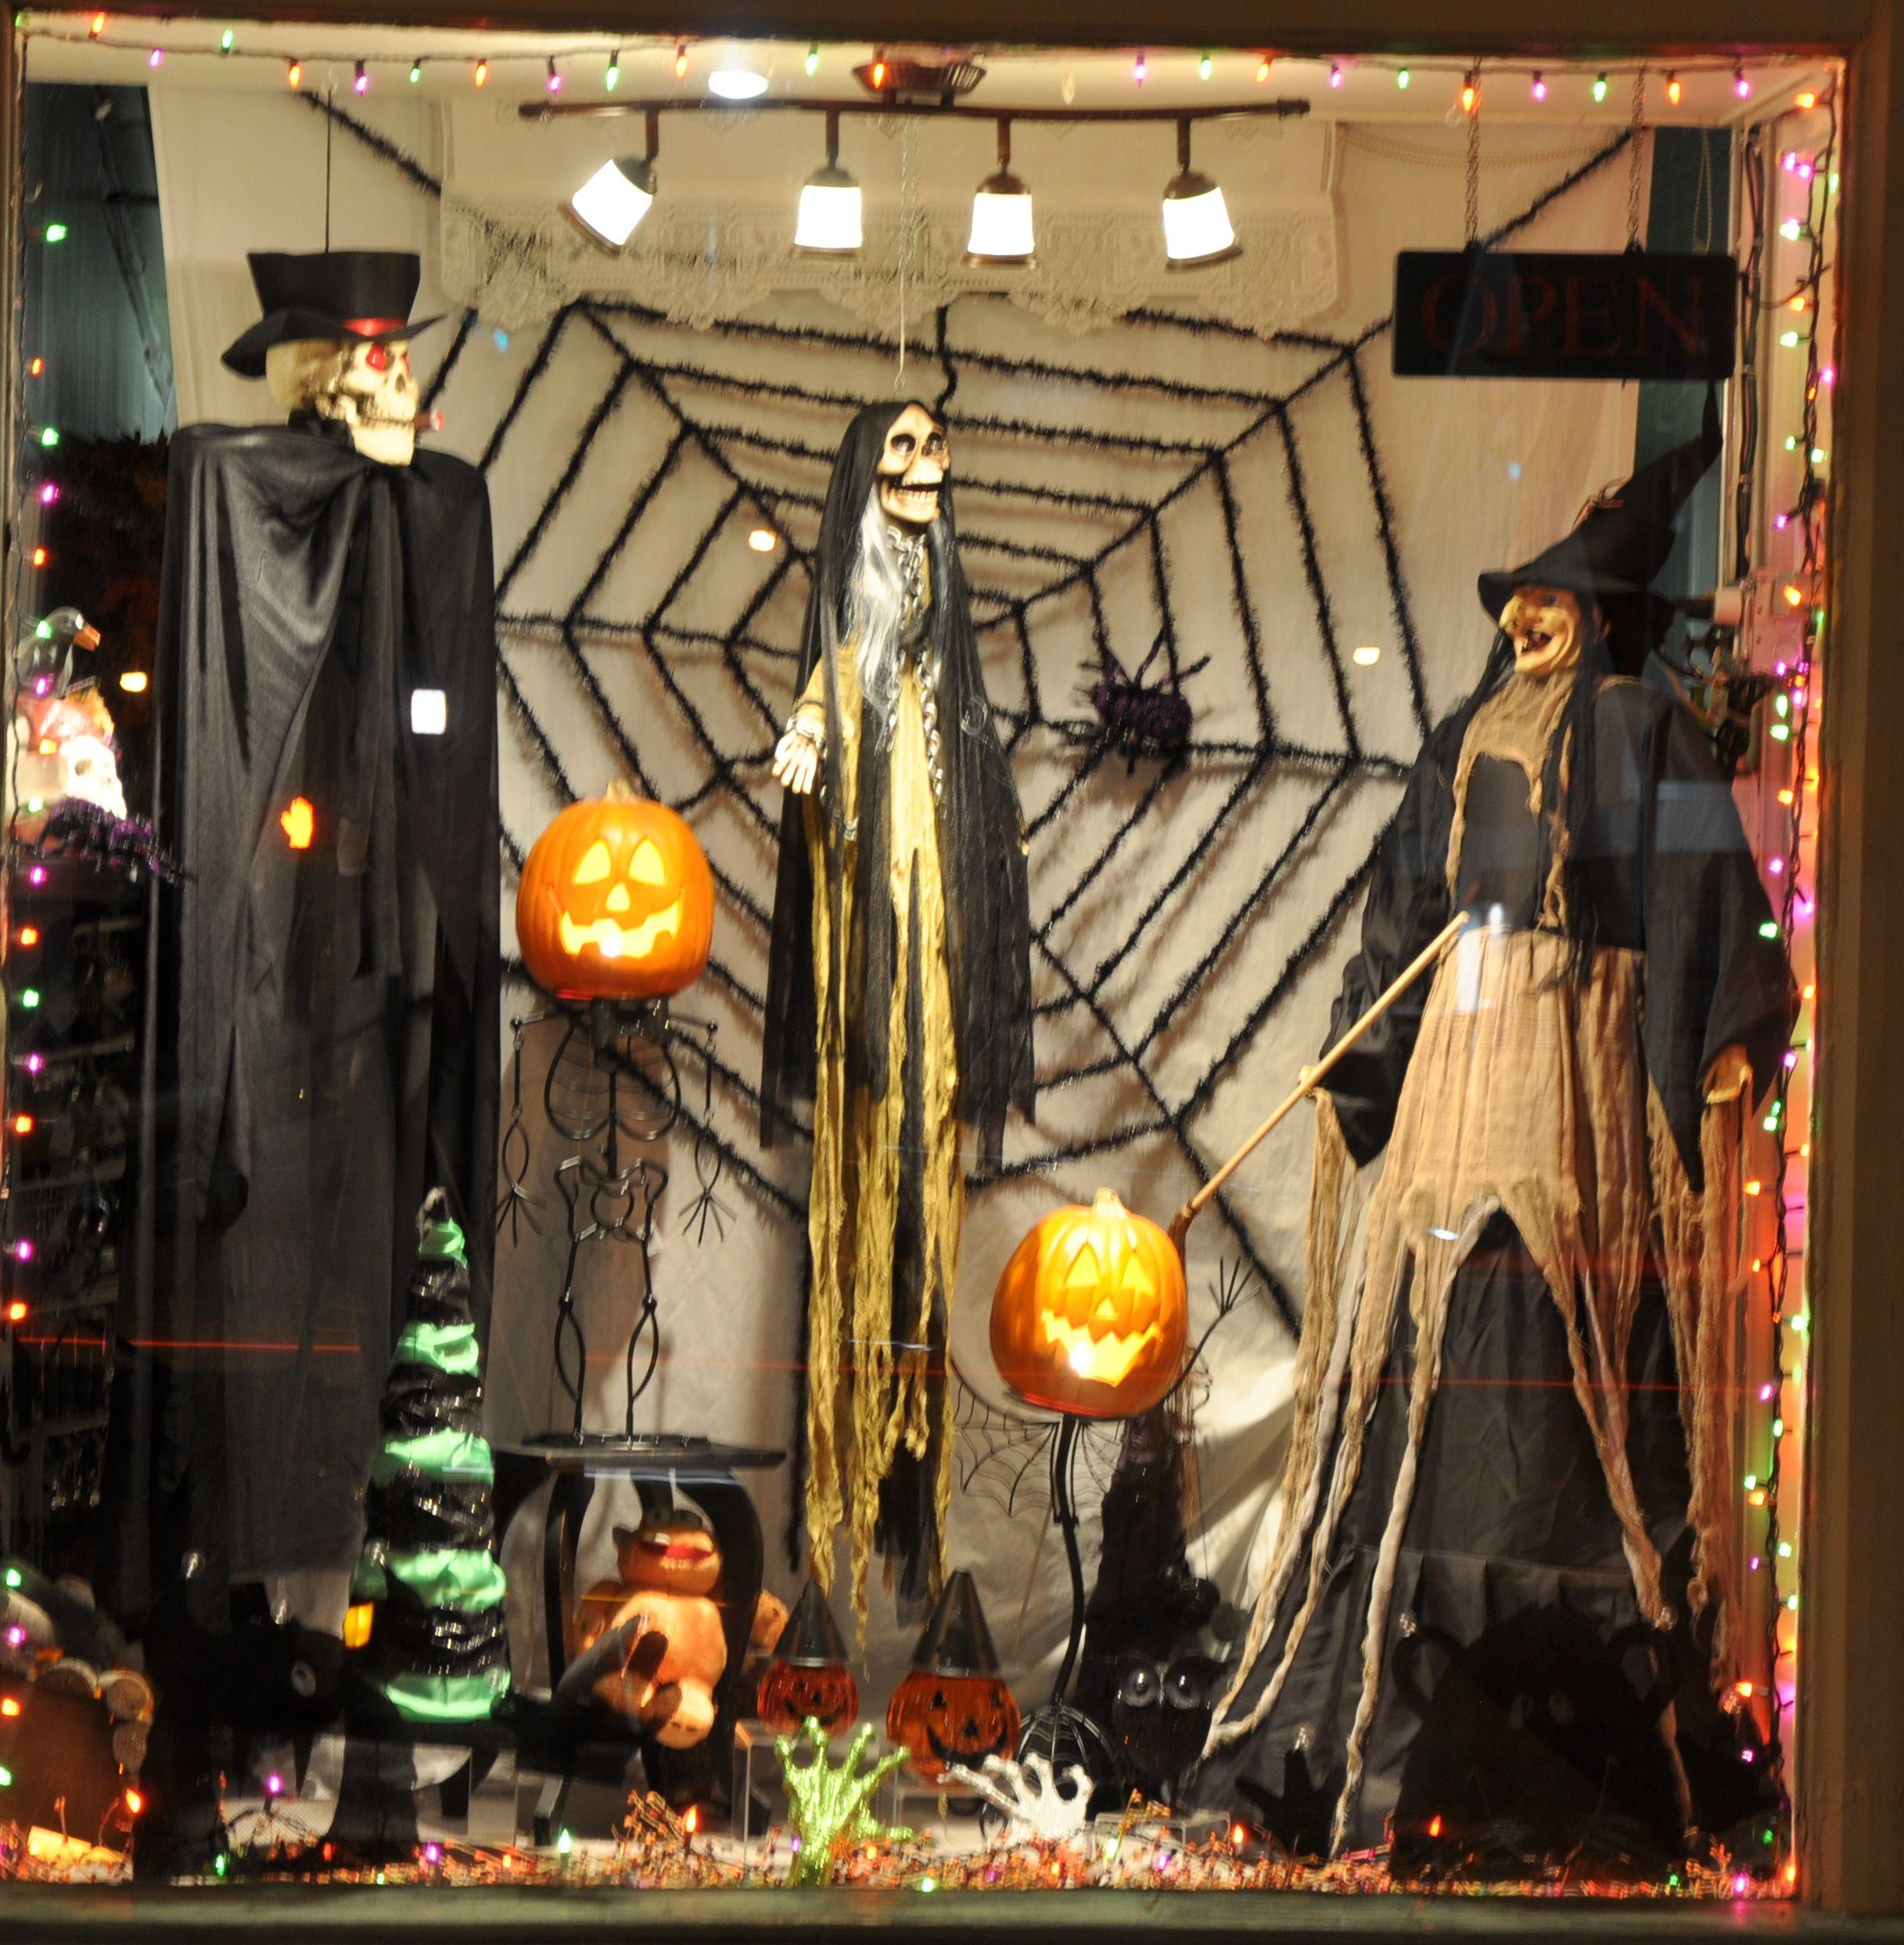 Decoration Halloween Magasin.14 Idees De Vitrine Halloween Halloween Deco Vitrine Vitrine Magasin